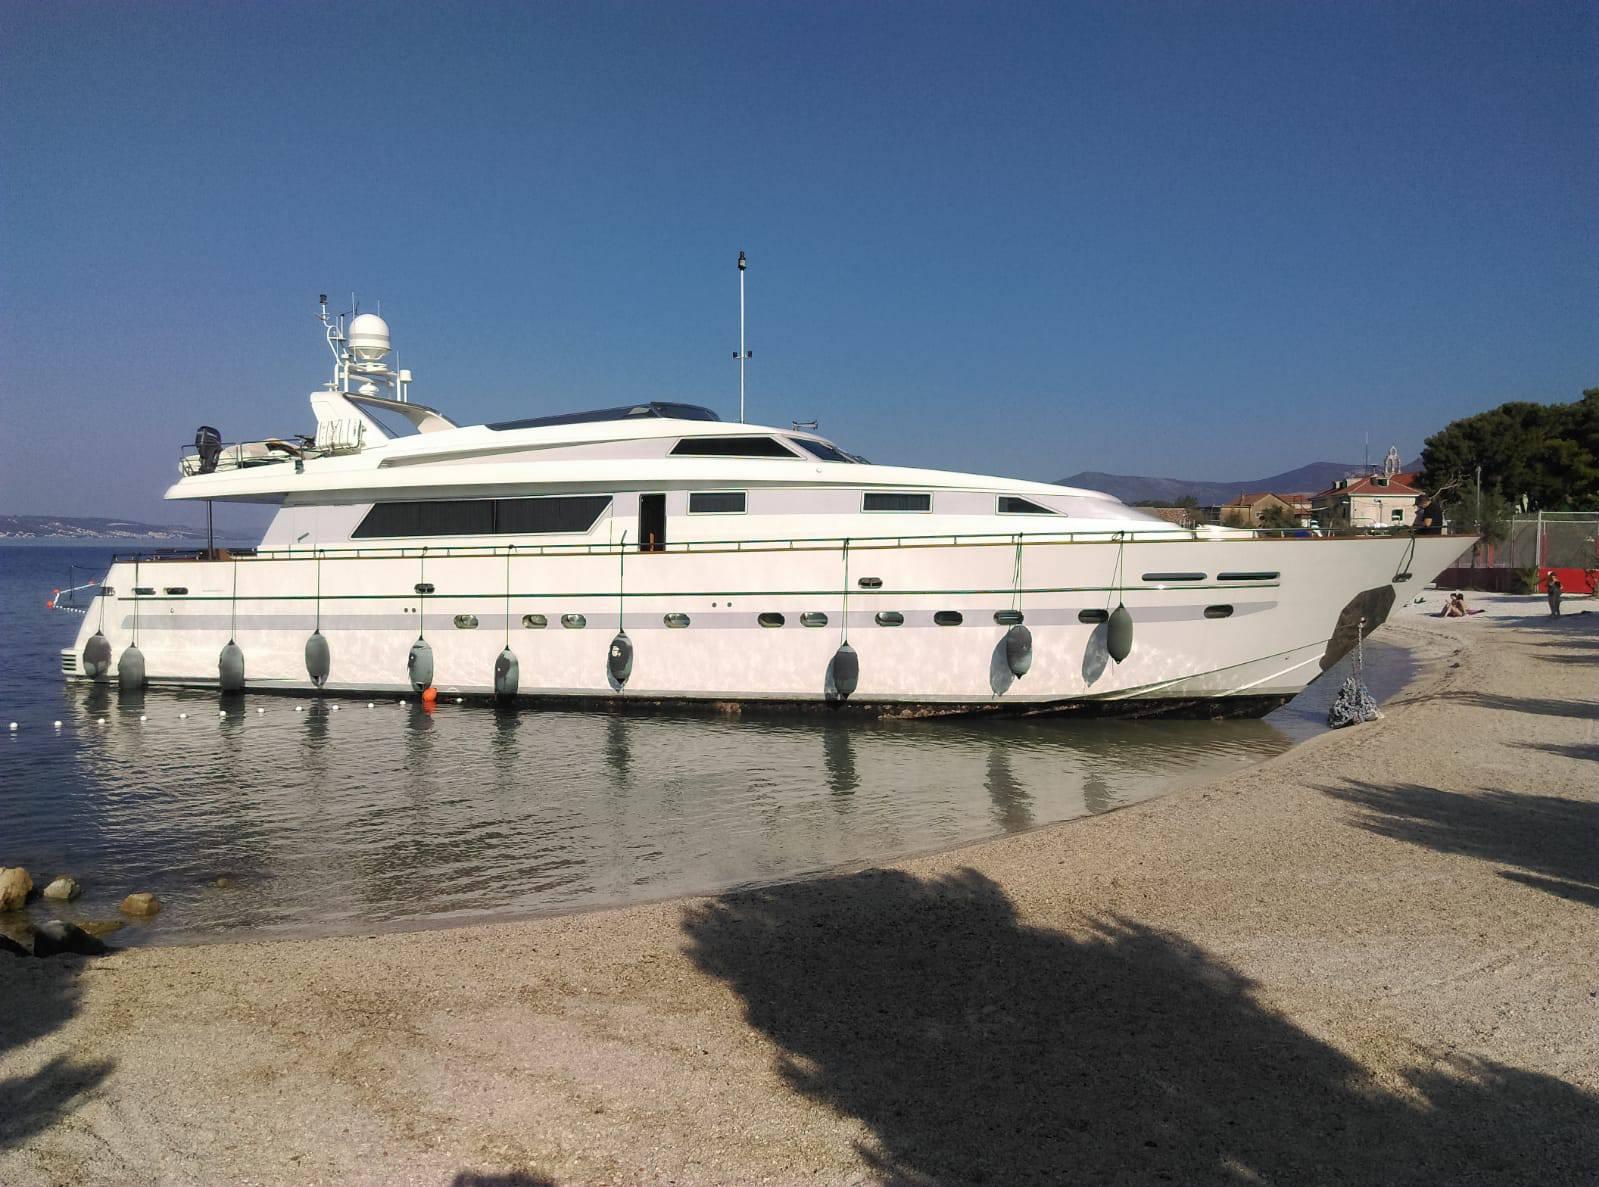 Jahta isplovljavala iz marine pa 'uplovila' na obližnju plažu